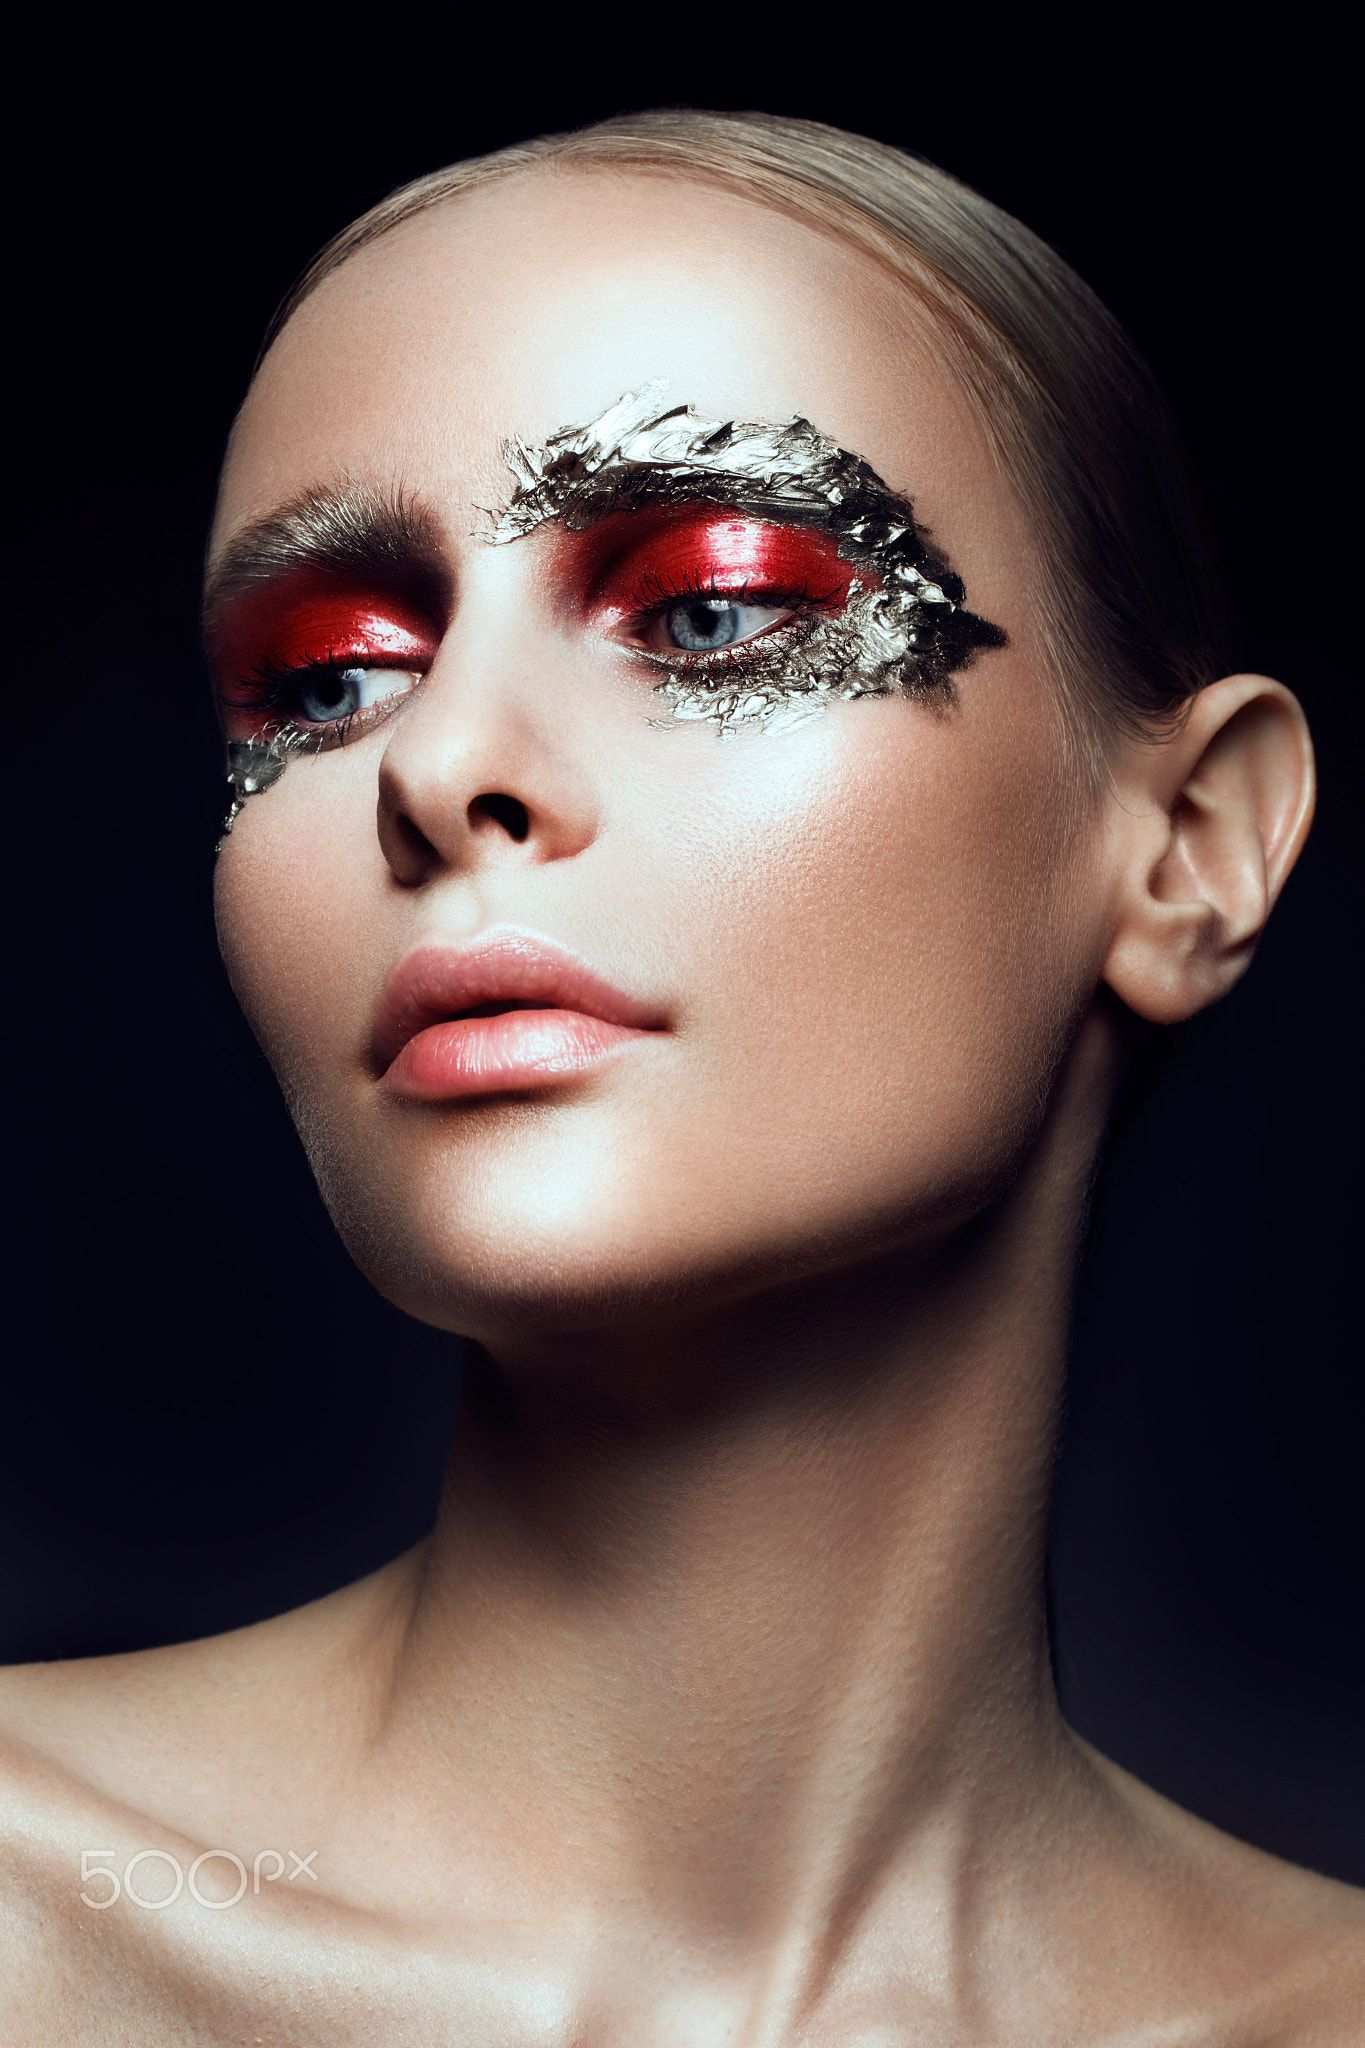 Fashion Art Make Up Woman Face Fashion Art Make Up Woman Face With Silver Paint Woman Face Fashion Art Face